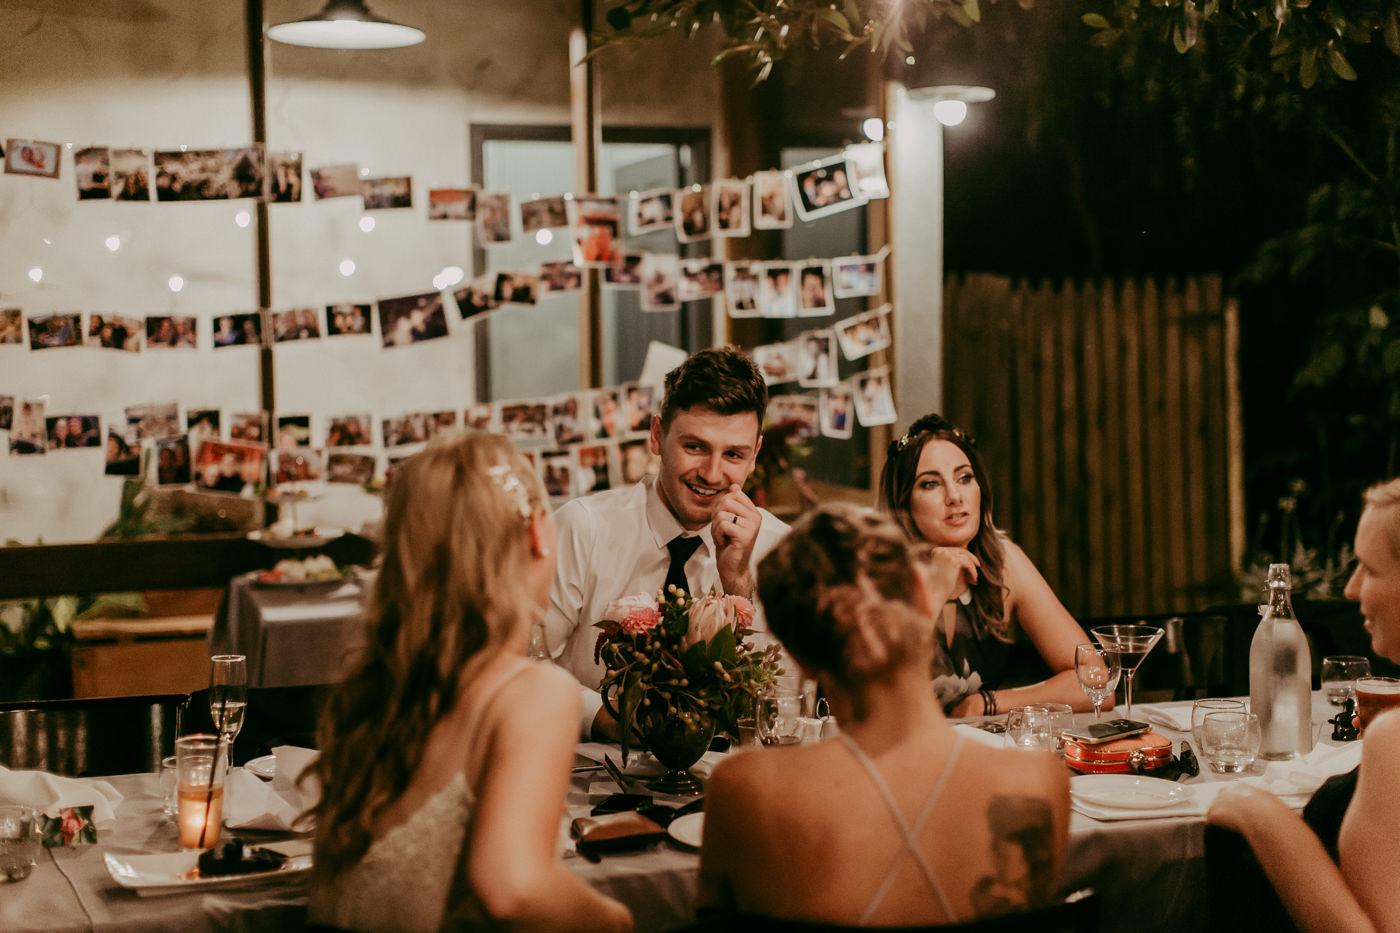 Anthony & Eliet - Wagga Wagga Wedding - Country NSW - Samantha Heather Photography-177.jpg